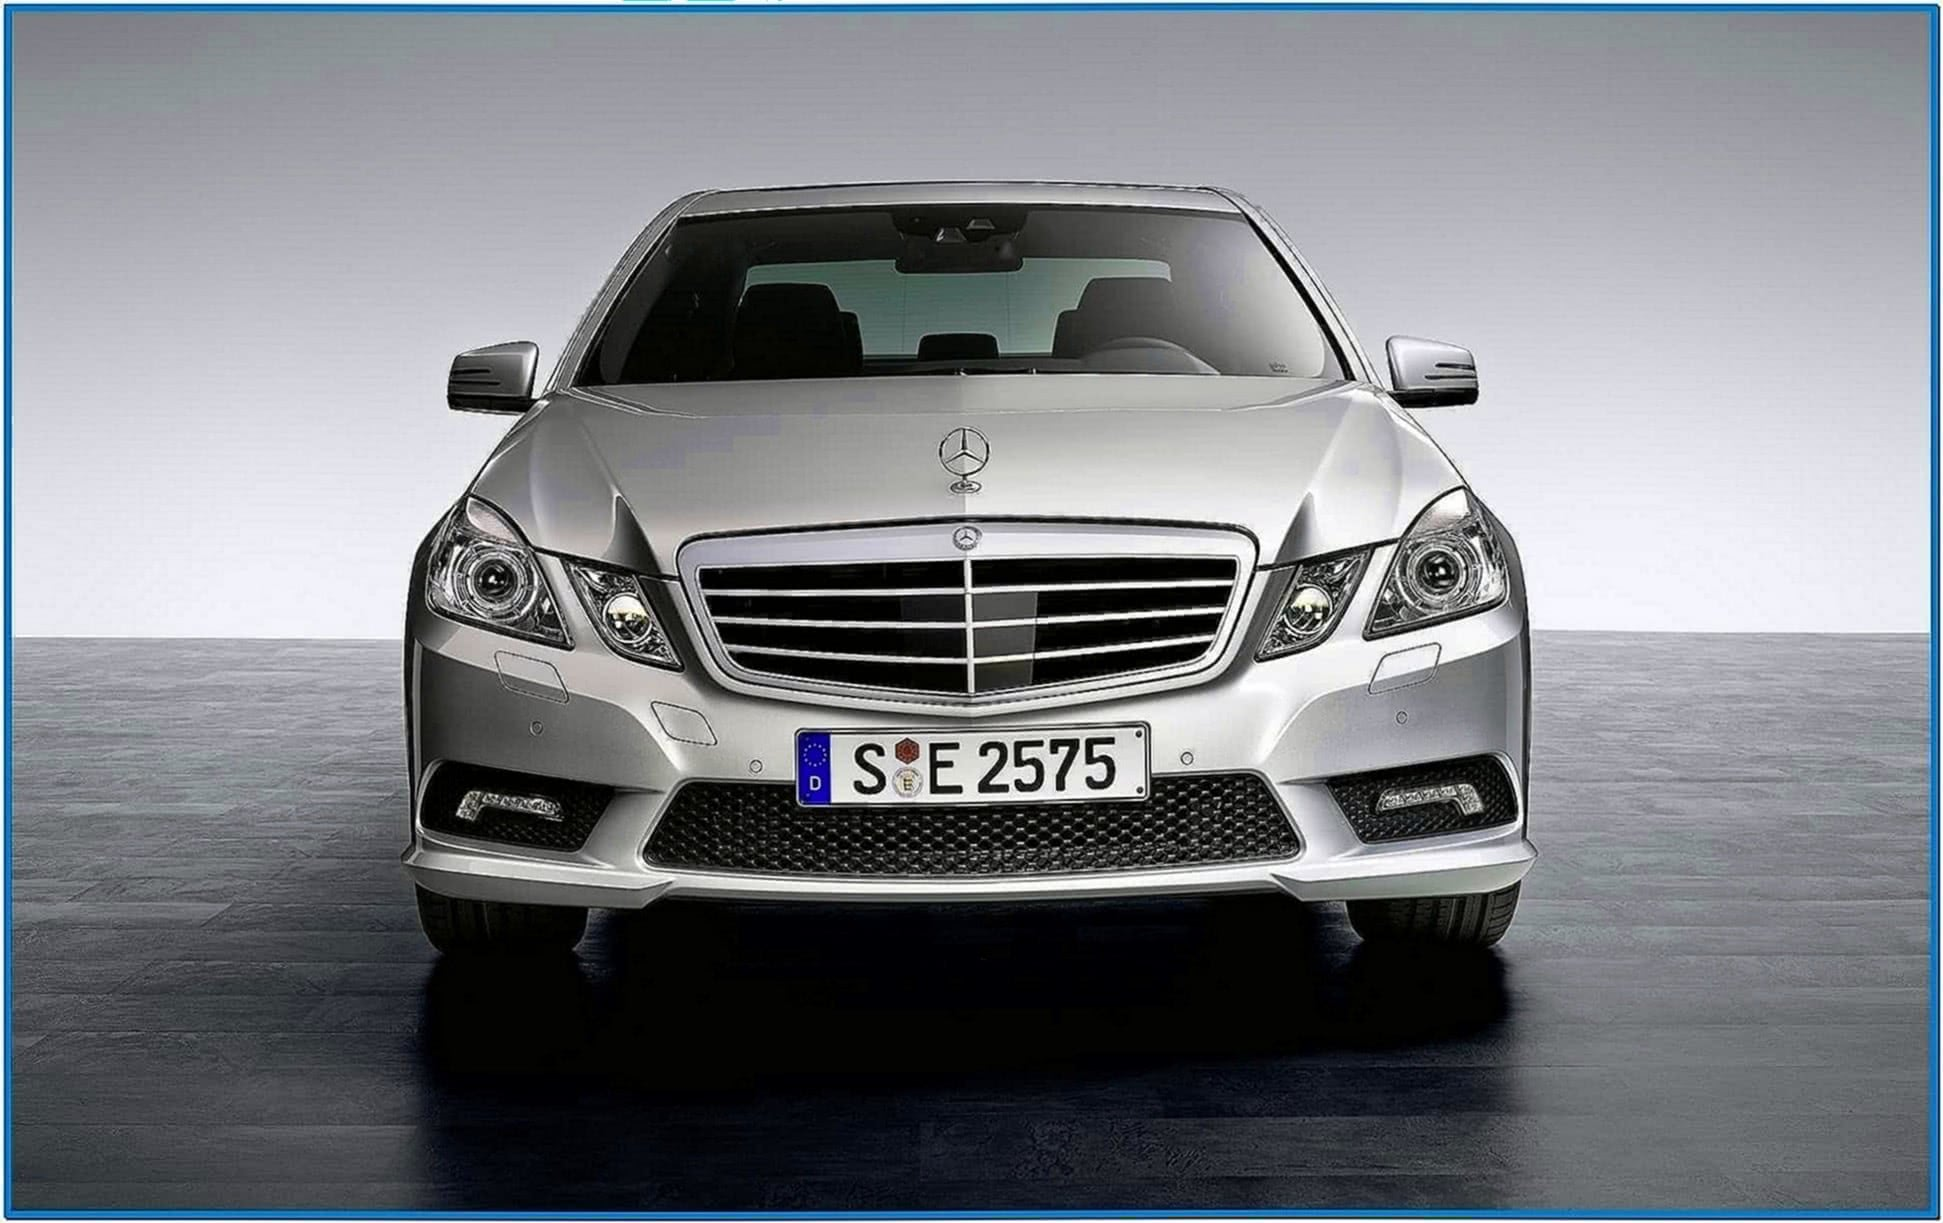 Mercedes Benz E Class Screensaver